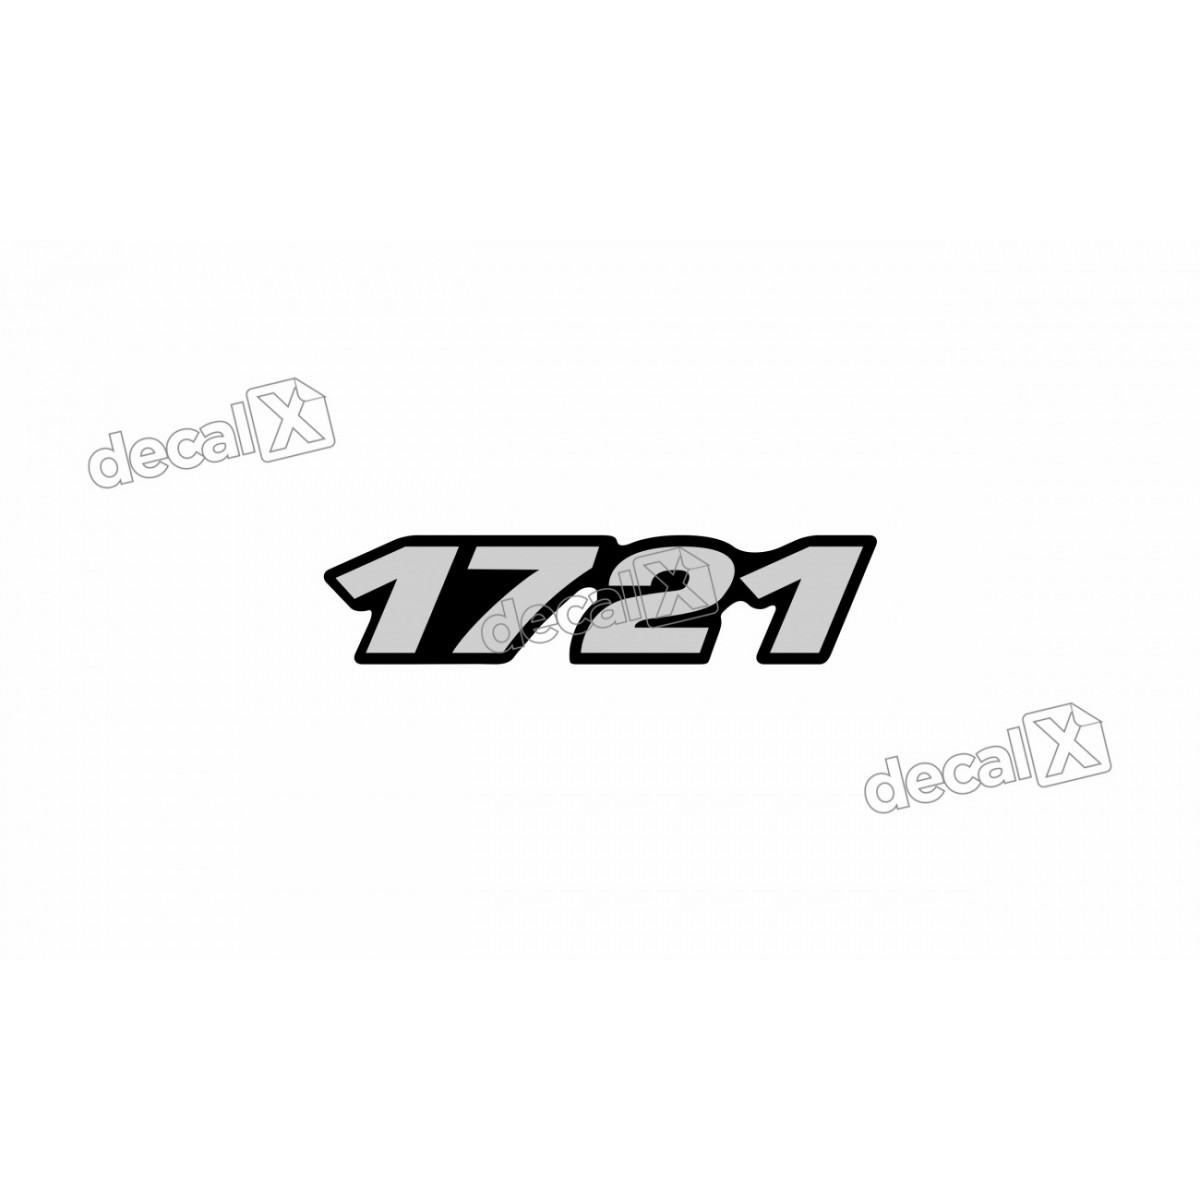 Adesivo Emblema Resinado Mercedes 1721 Cm61 Decalx